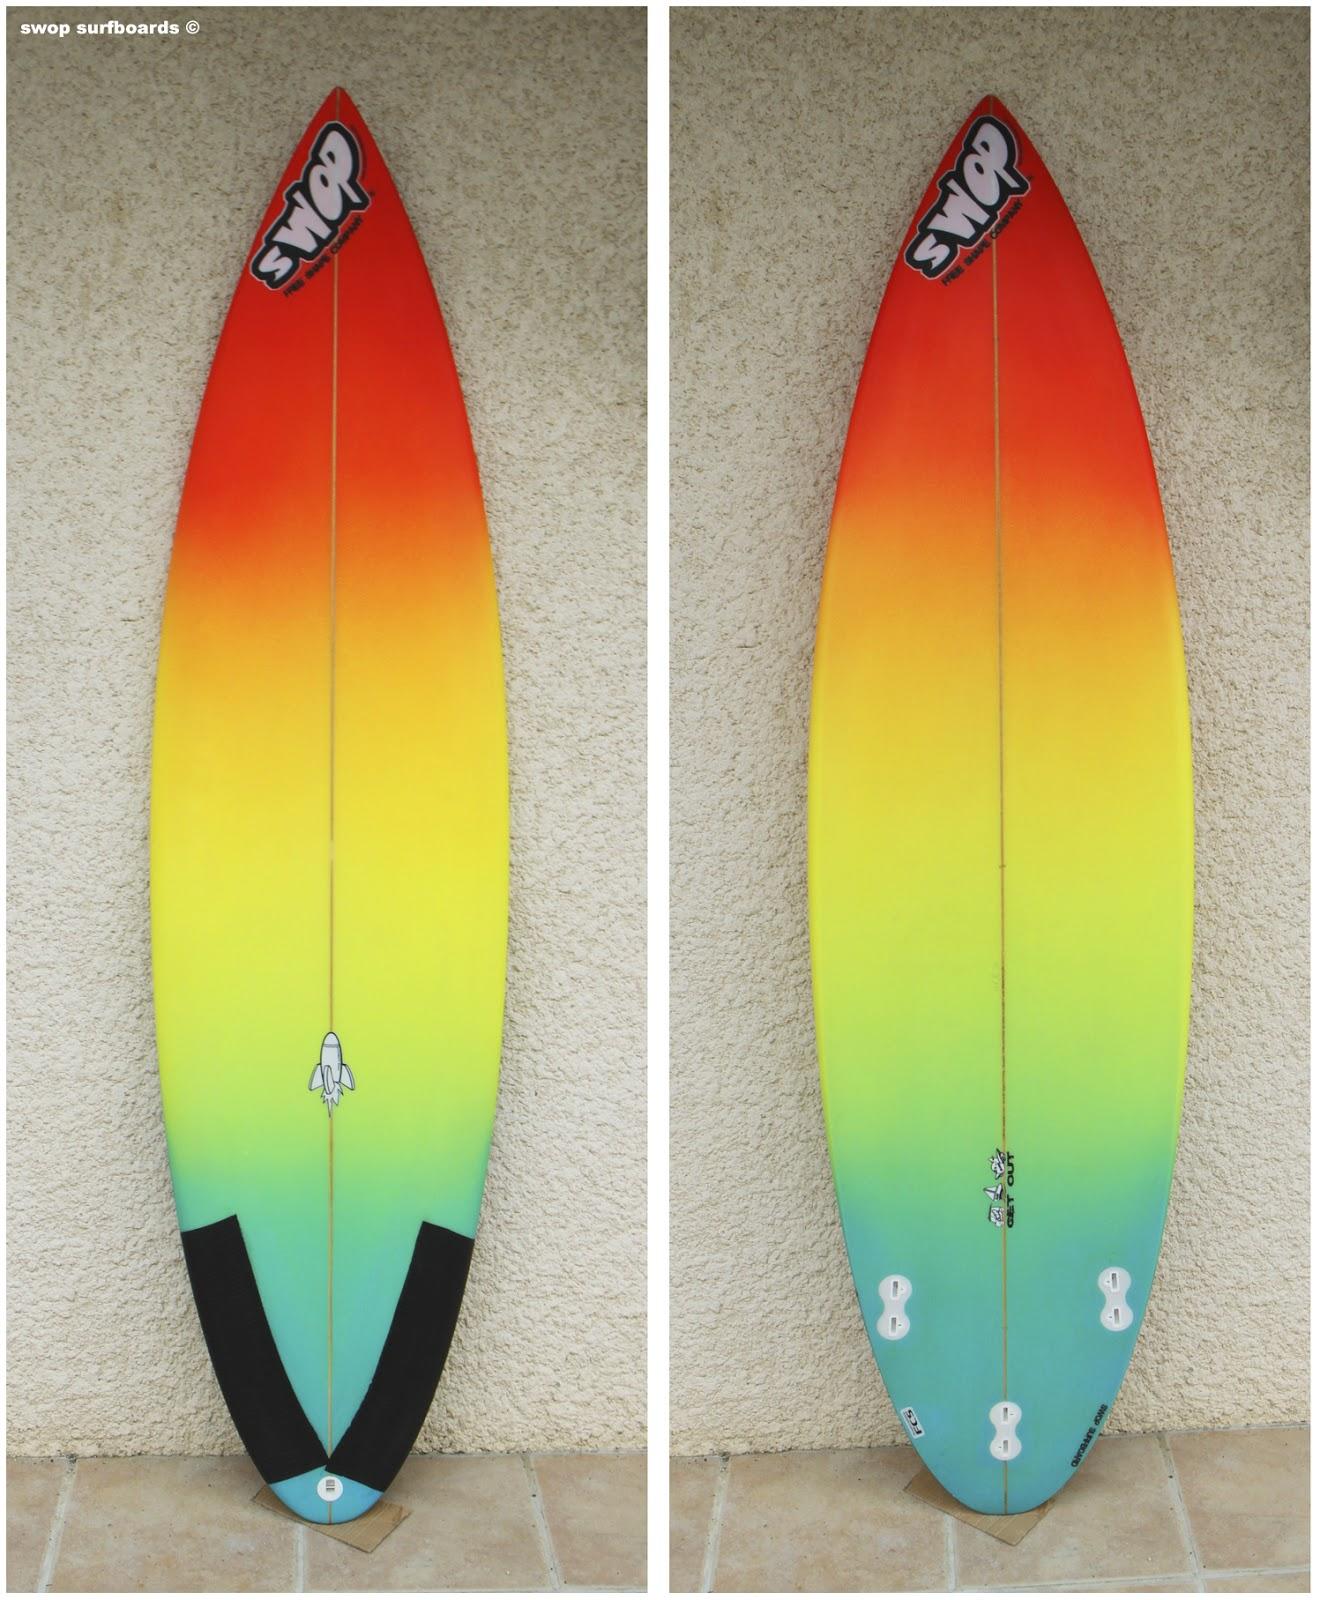 swop surfboards rainbow shortboard. Black Bedroom Furniture Sets. Home Design Ideas